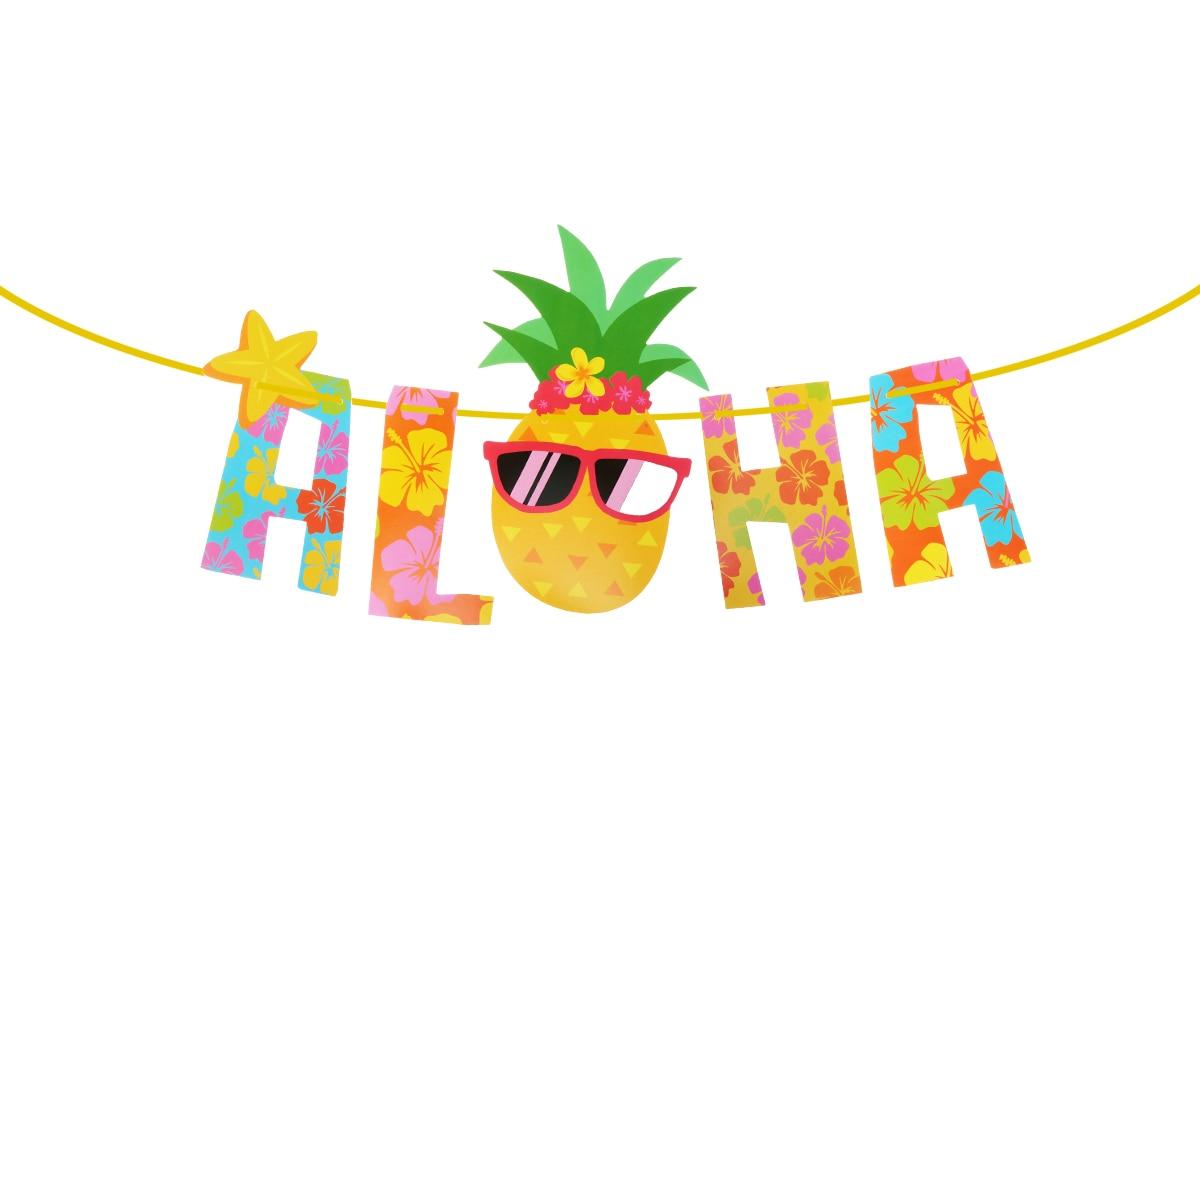 2.2 Meters Luau Party Banner Aloha Hawaii Theme Beach ... (1200 x 1200 Pixel)